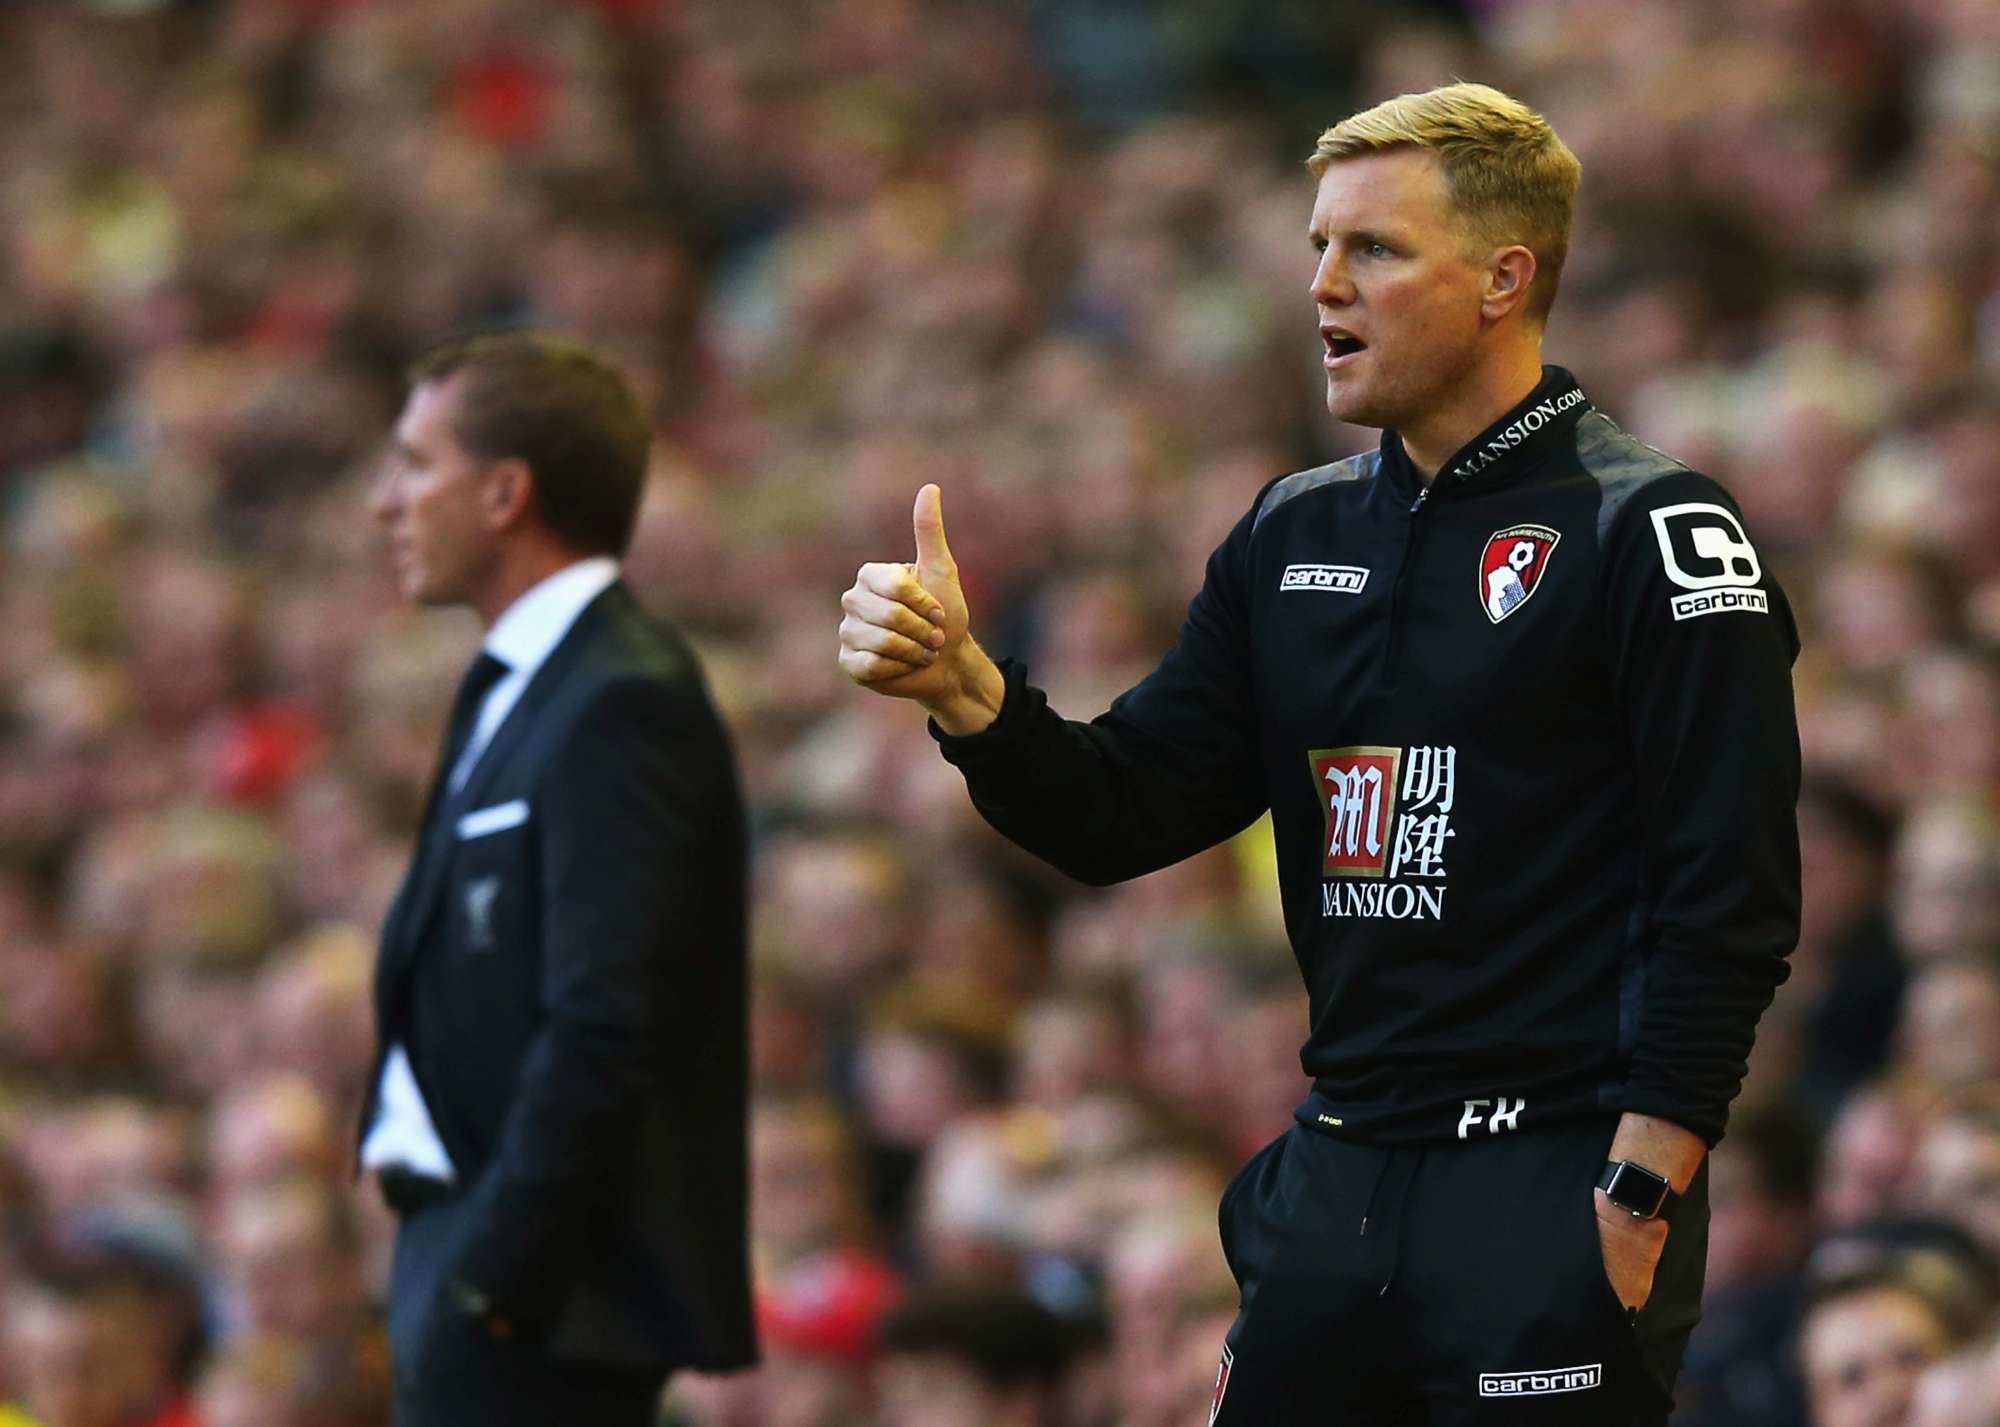 Eddie Howe, tecnico del Bournemouth